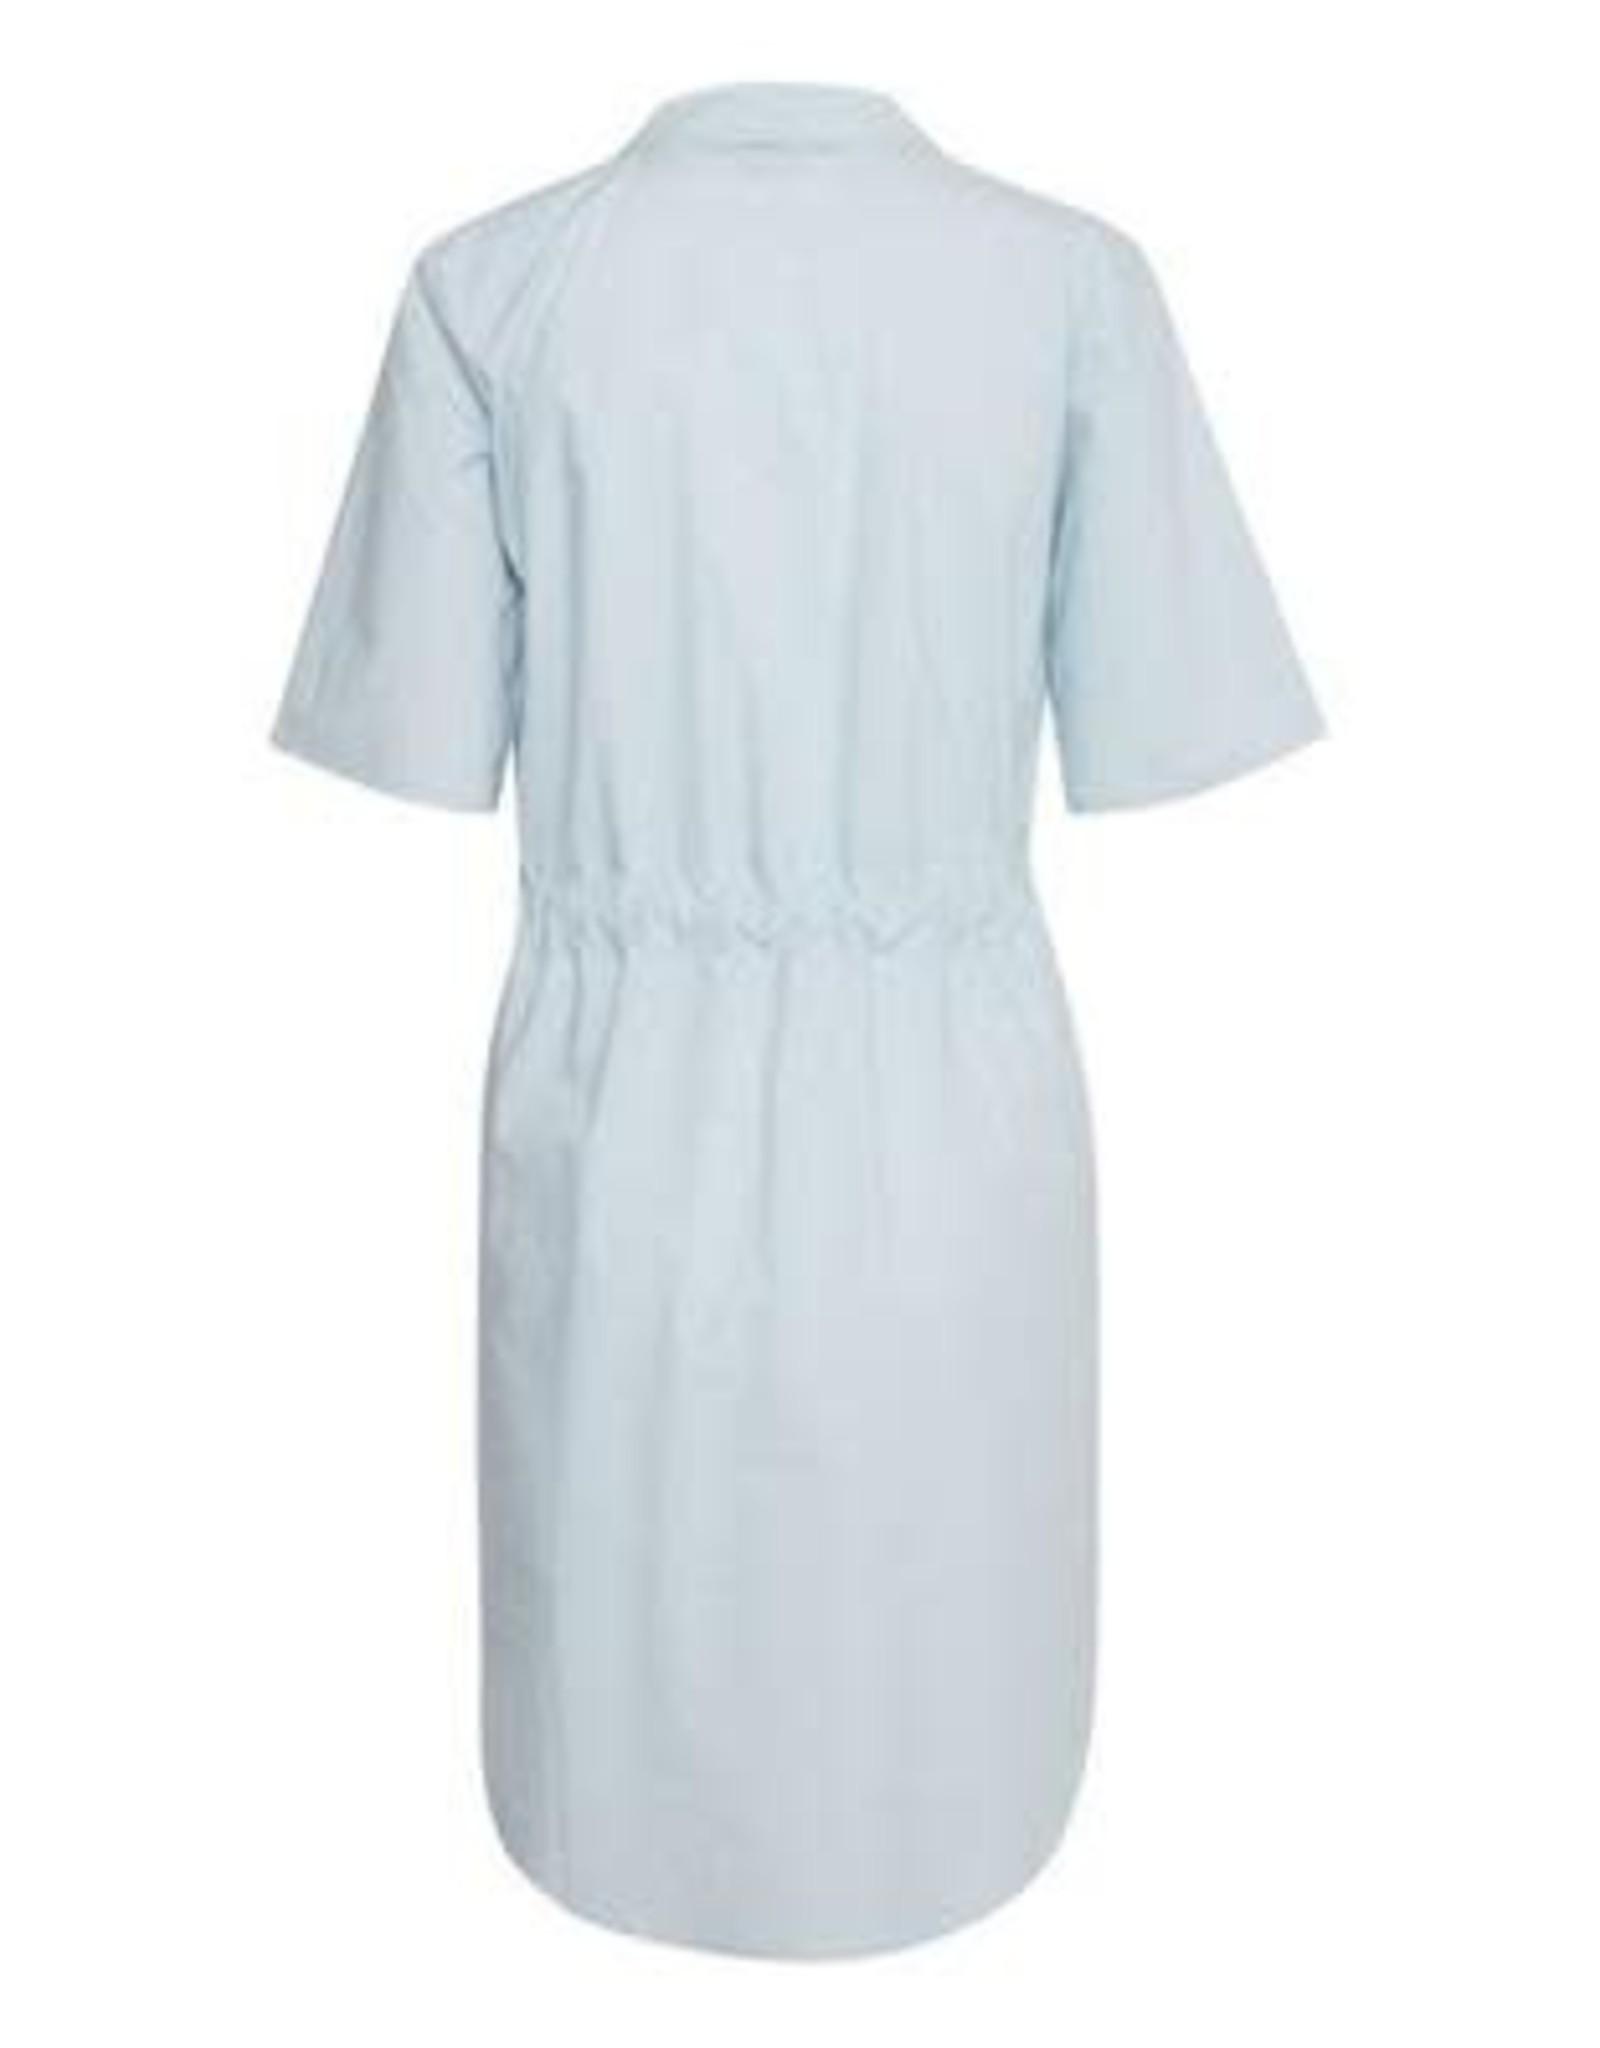 Ichi Inkala Shirt Dress with Tie Cool Blue